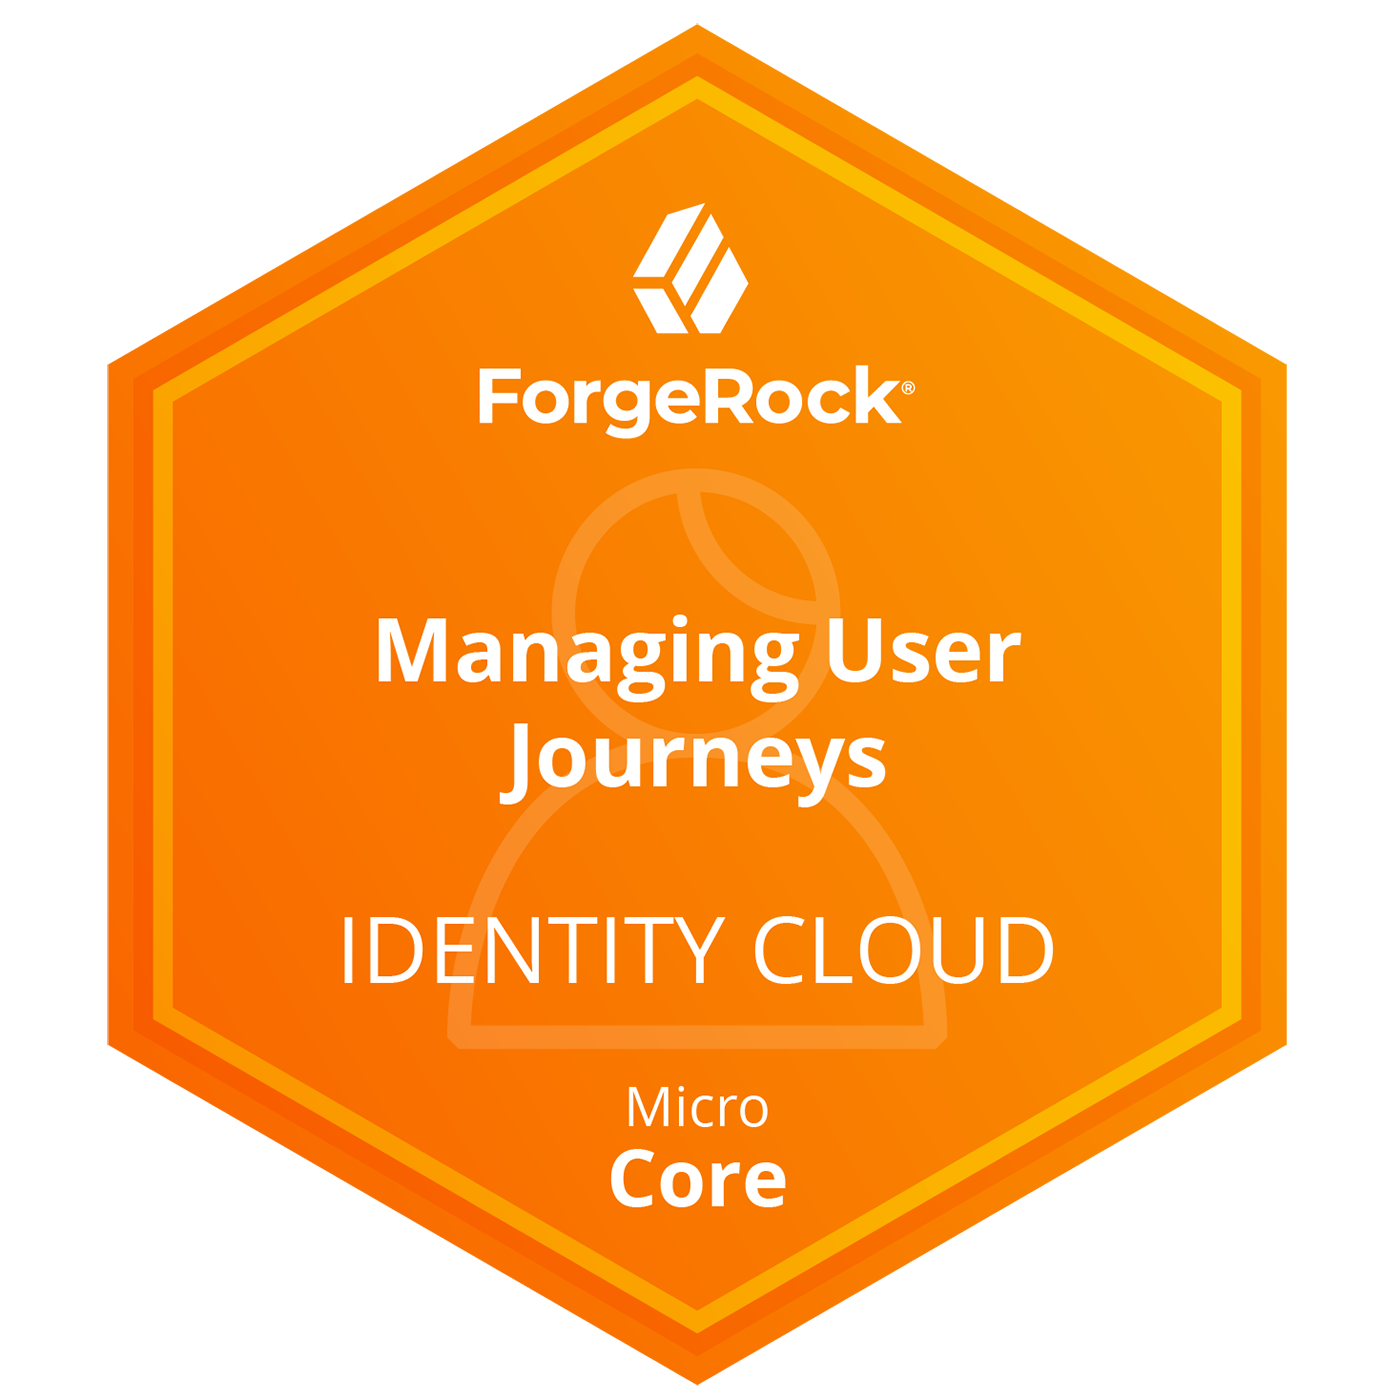 ForgeRock Identity Cloud Micro Core Skills - Managing User Journeys